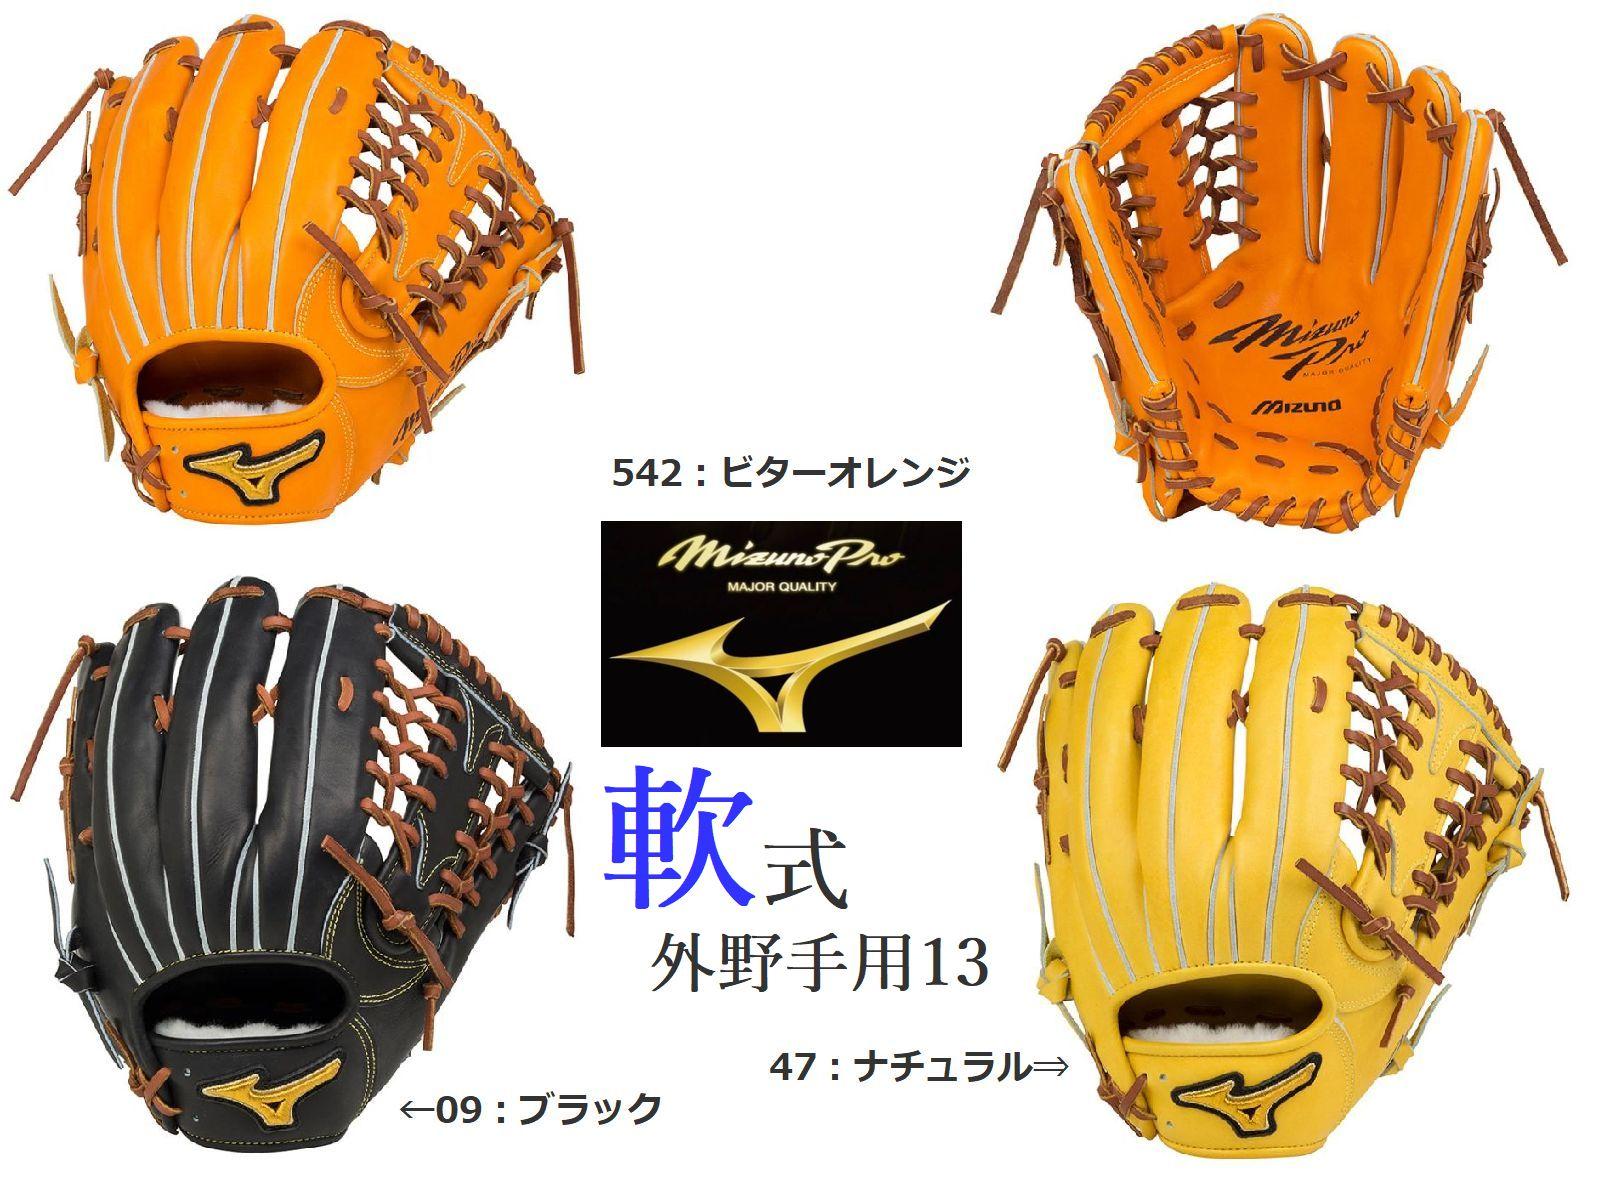 【Mizuno PRO=ミズノプロ】野球 一般 軟式用 グラブ グローブ<フィンガーコアテクノロジー【外野手用13(タイト設計タイプ】>(サイズ:13)<ナチュラル/ビターオレンジ/ブラック>(右投用/左投用)